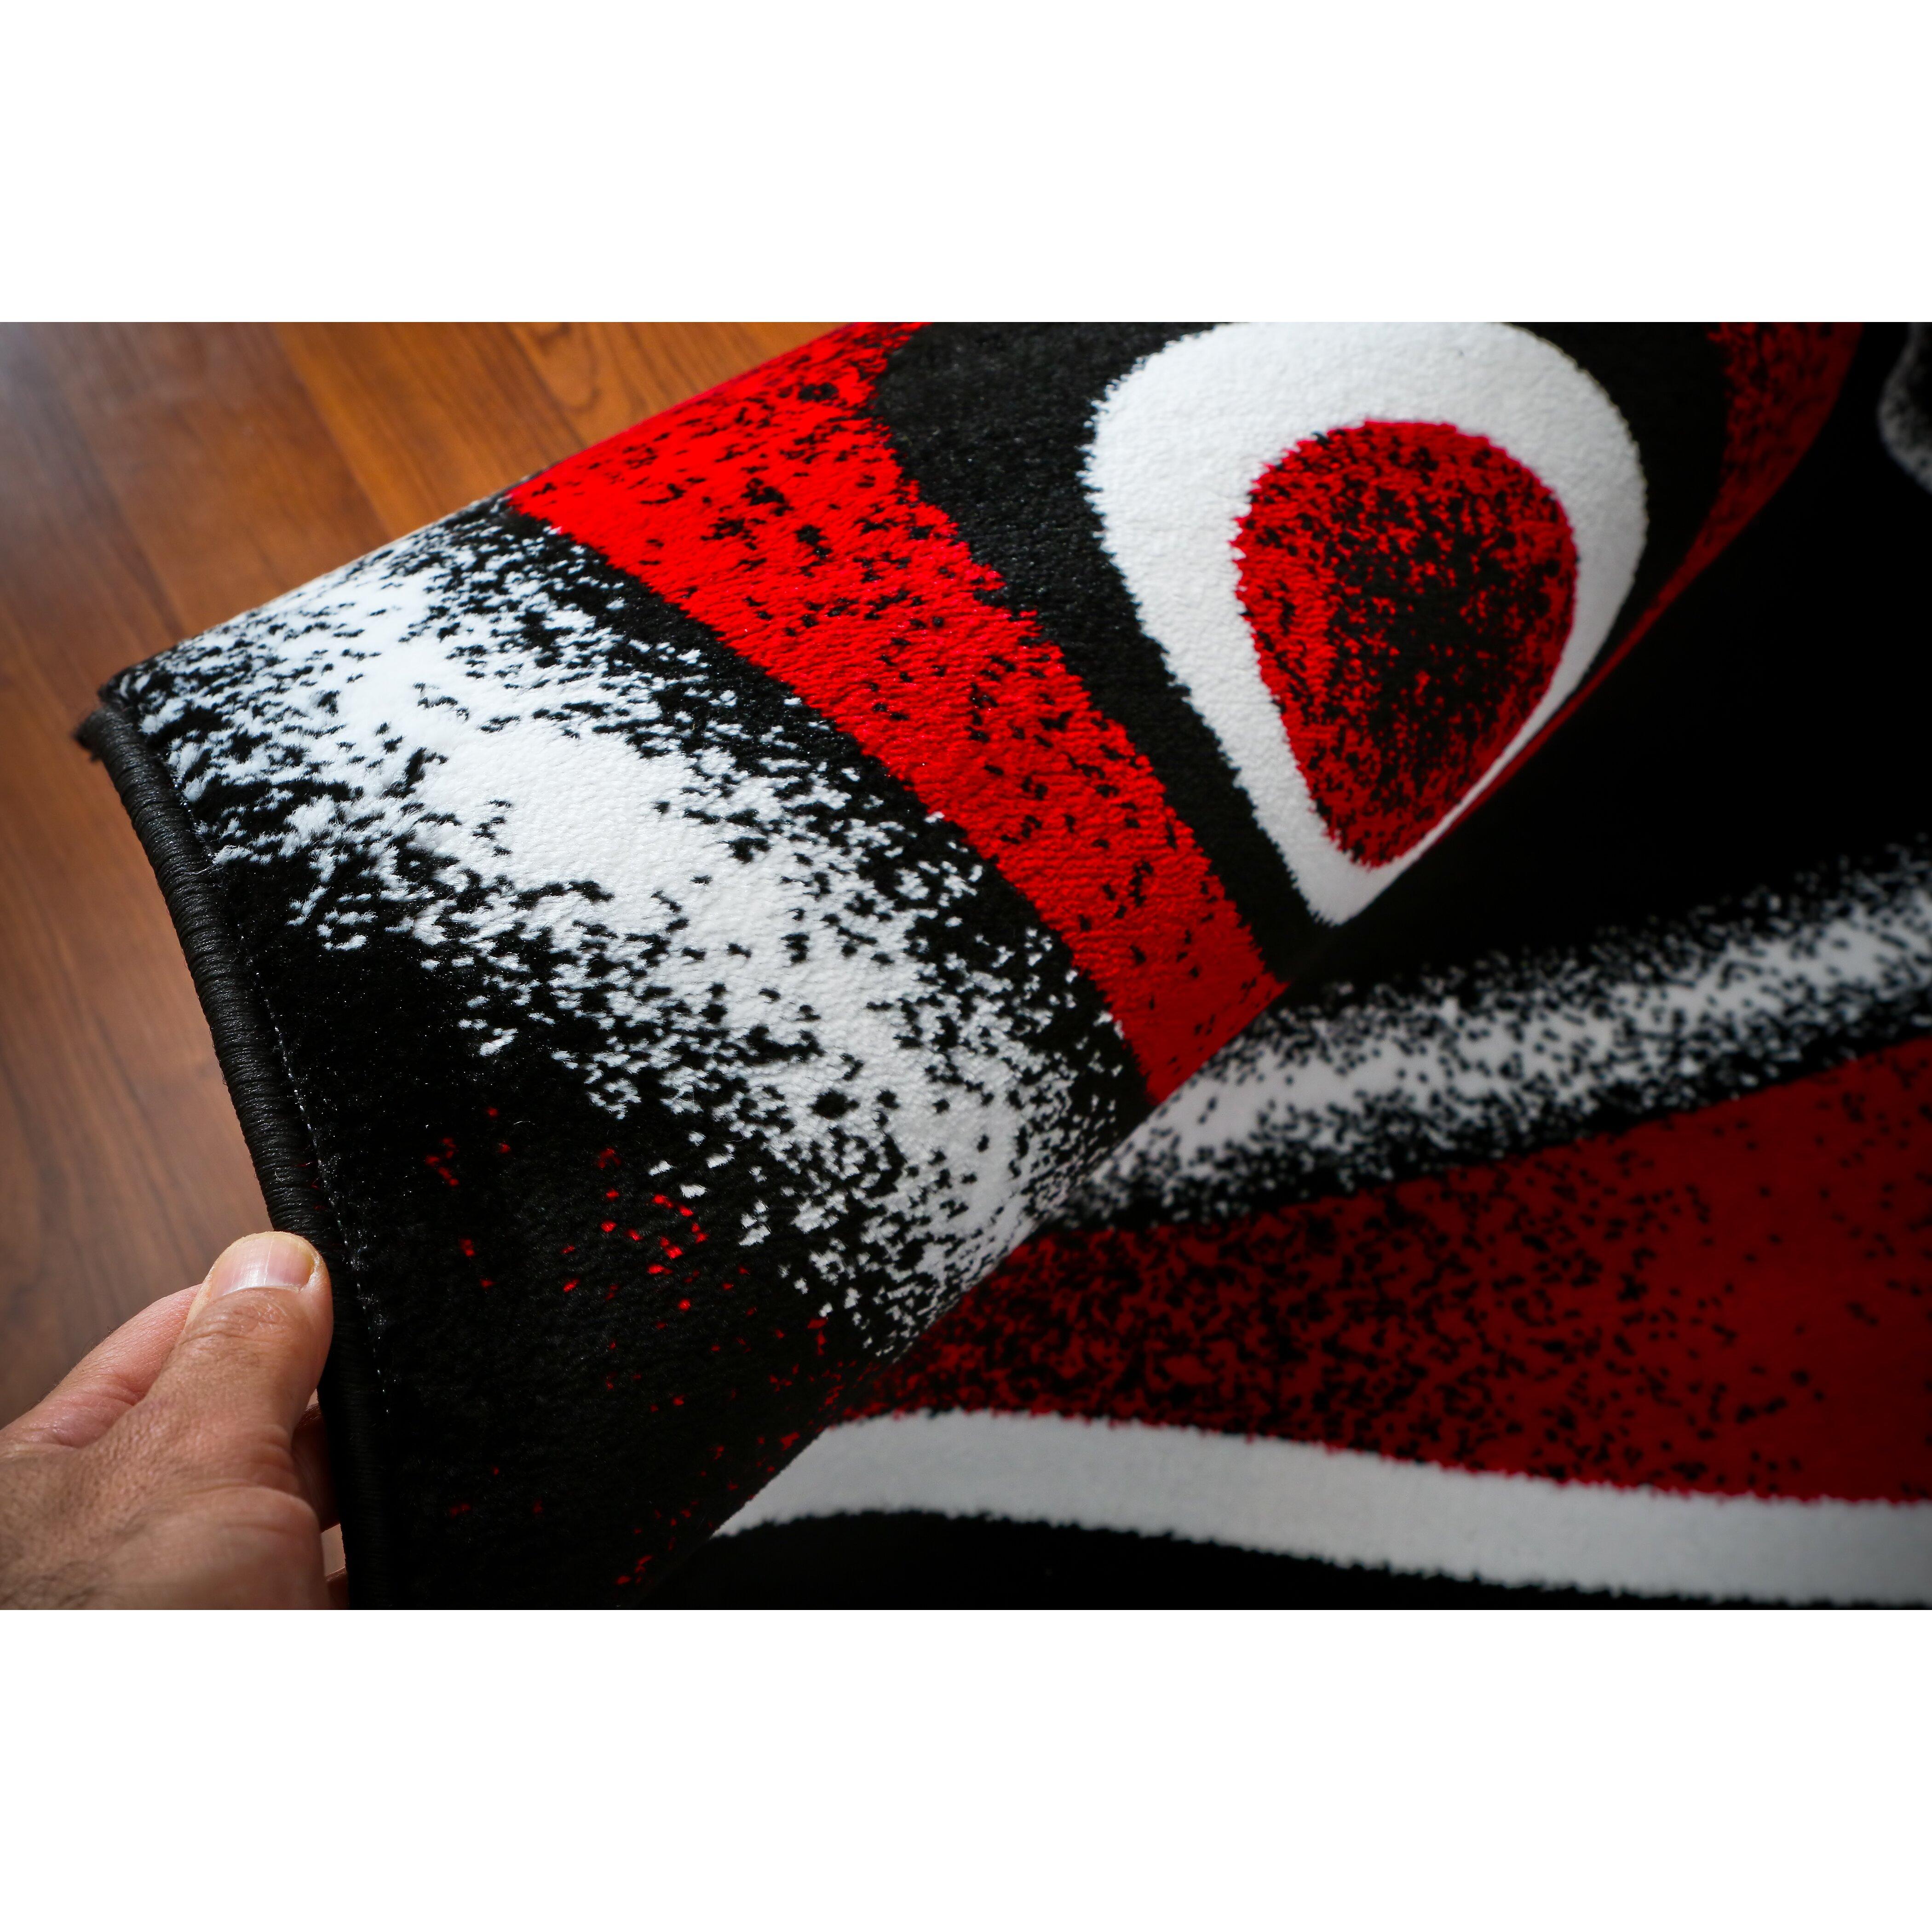 ^ Persian-rugs bstract ed rea ug & eviews Wayfair